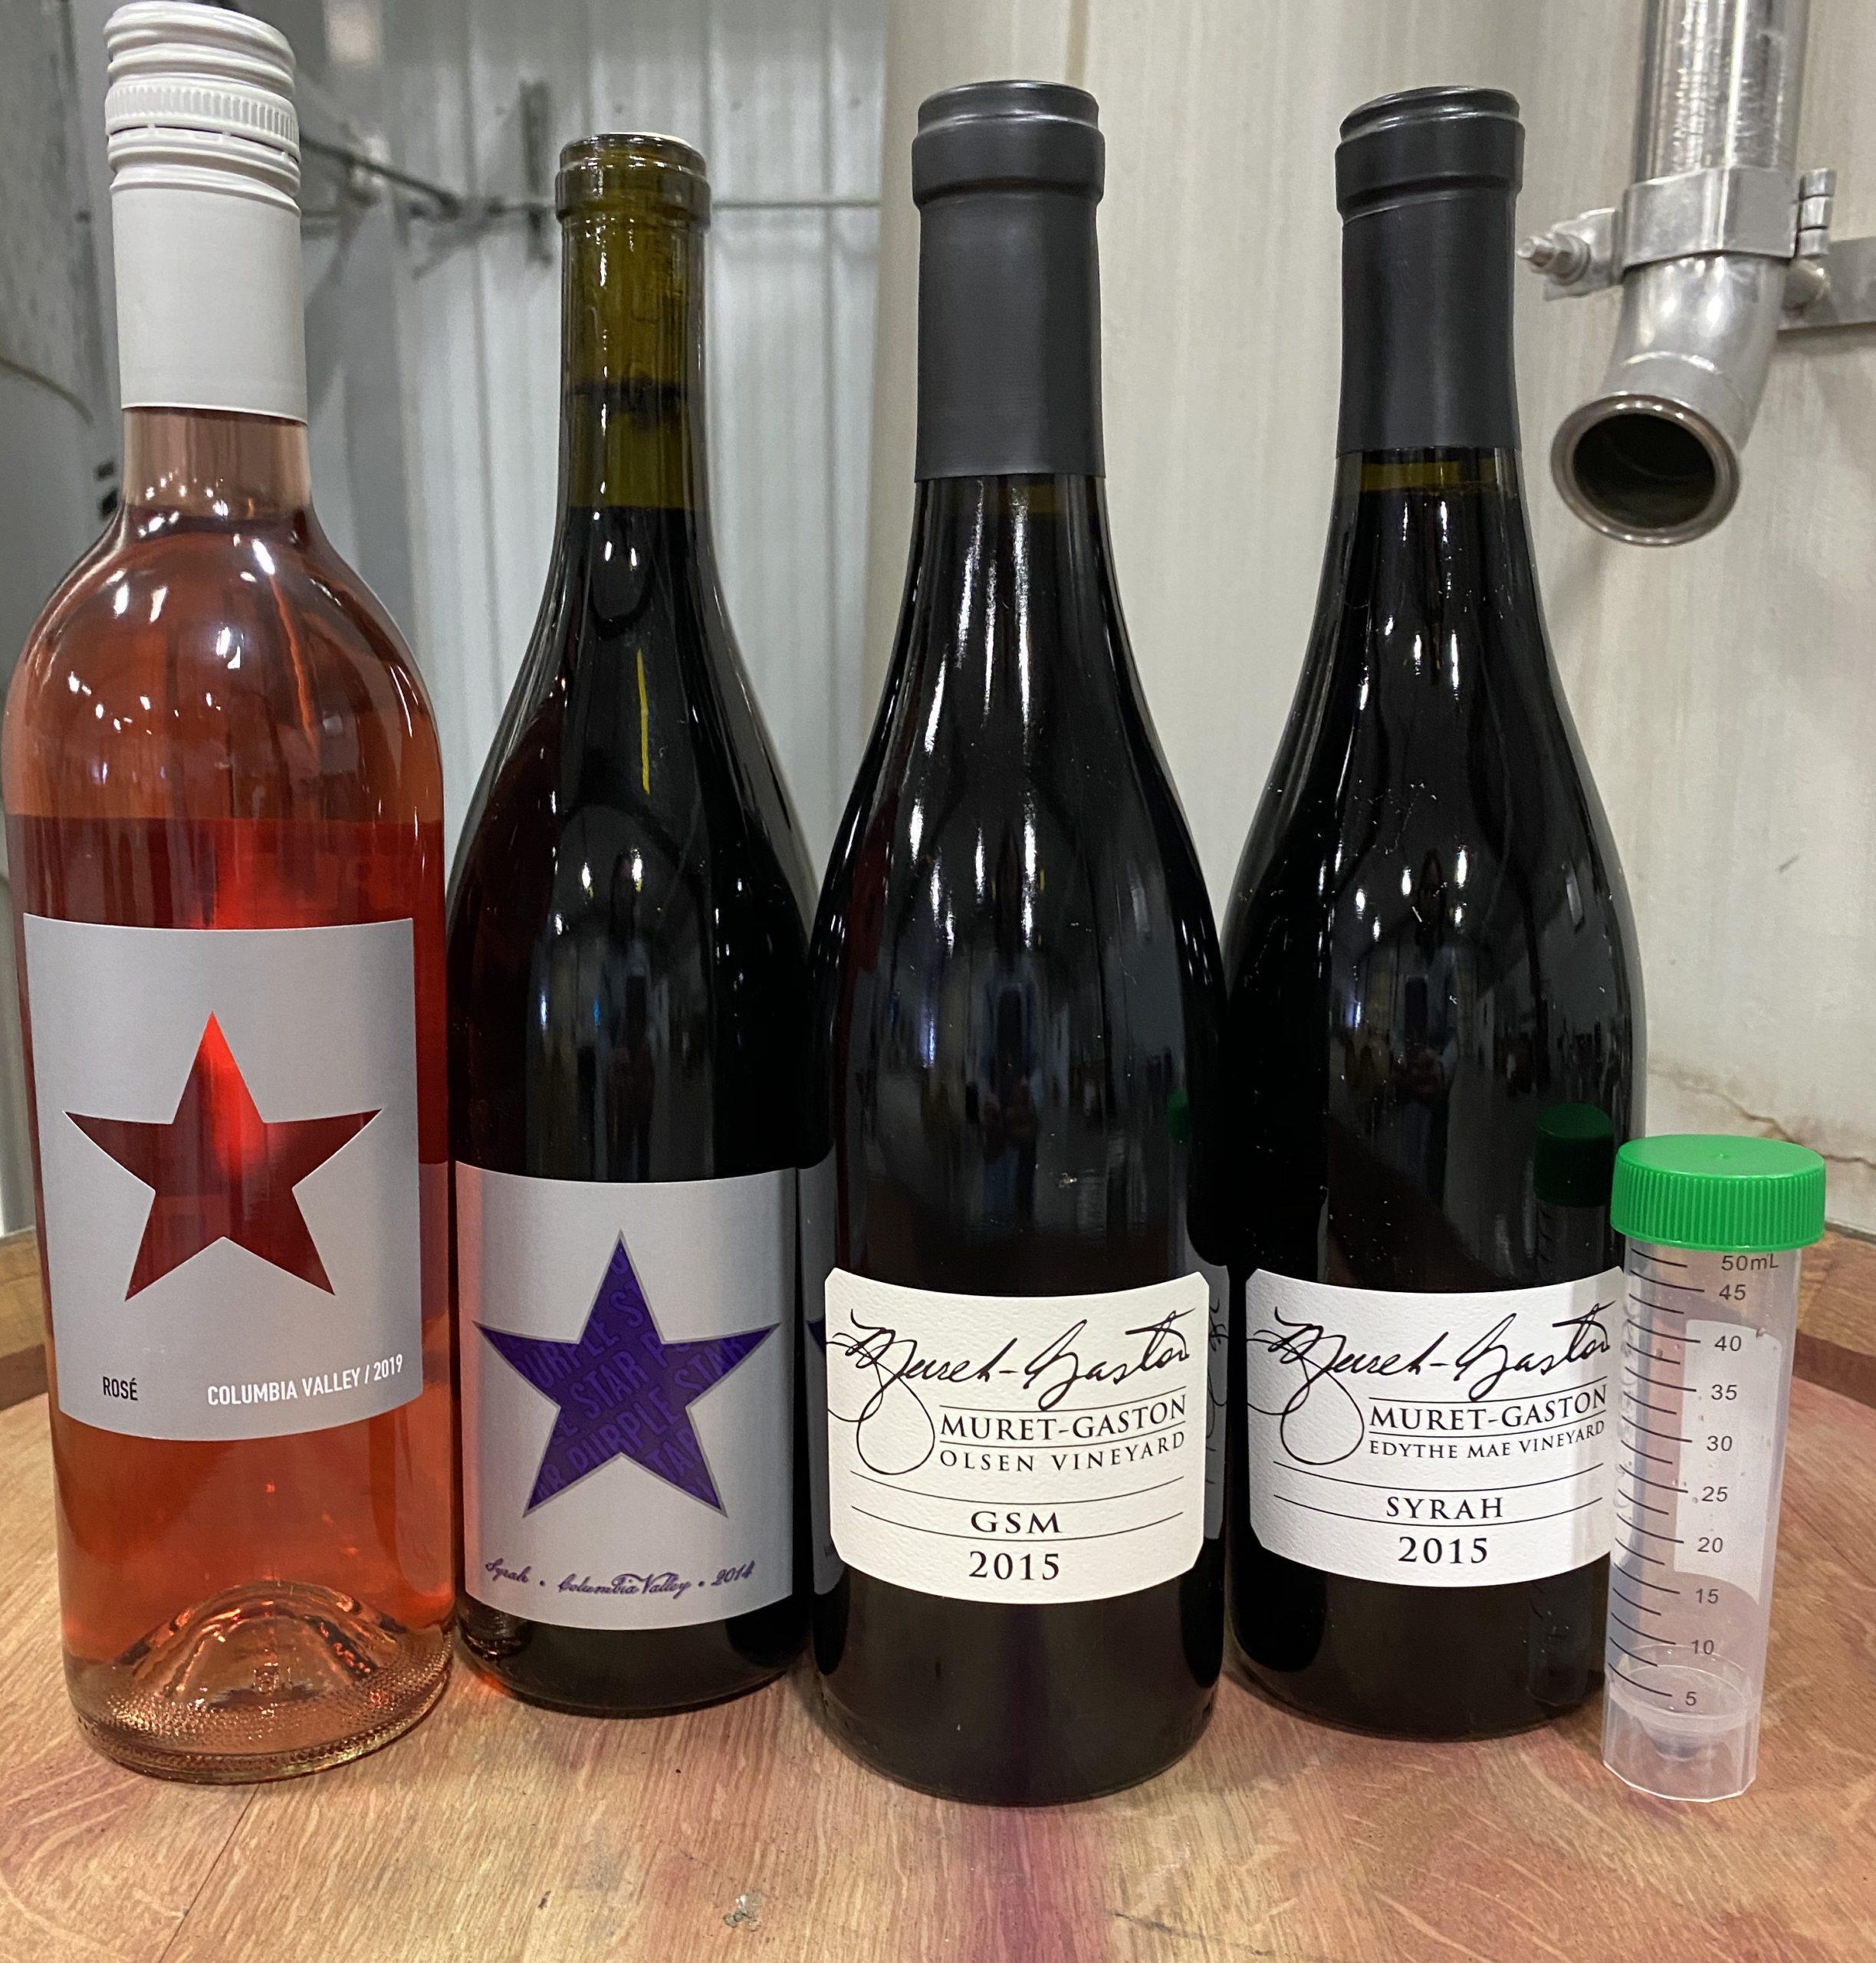 Syrah Saturday line up scaled - Syrah Saturday To Go Tasting with Purple Star